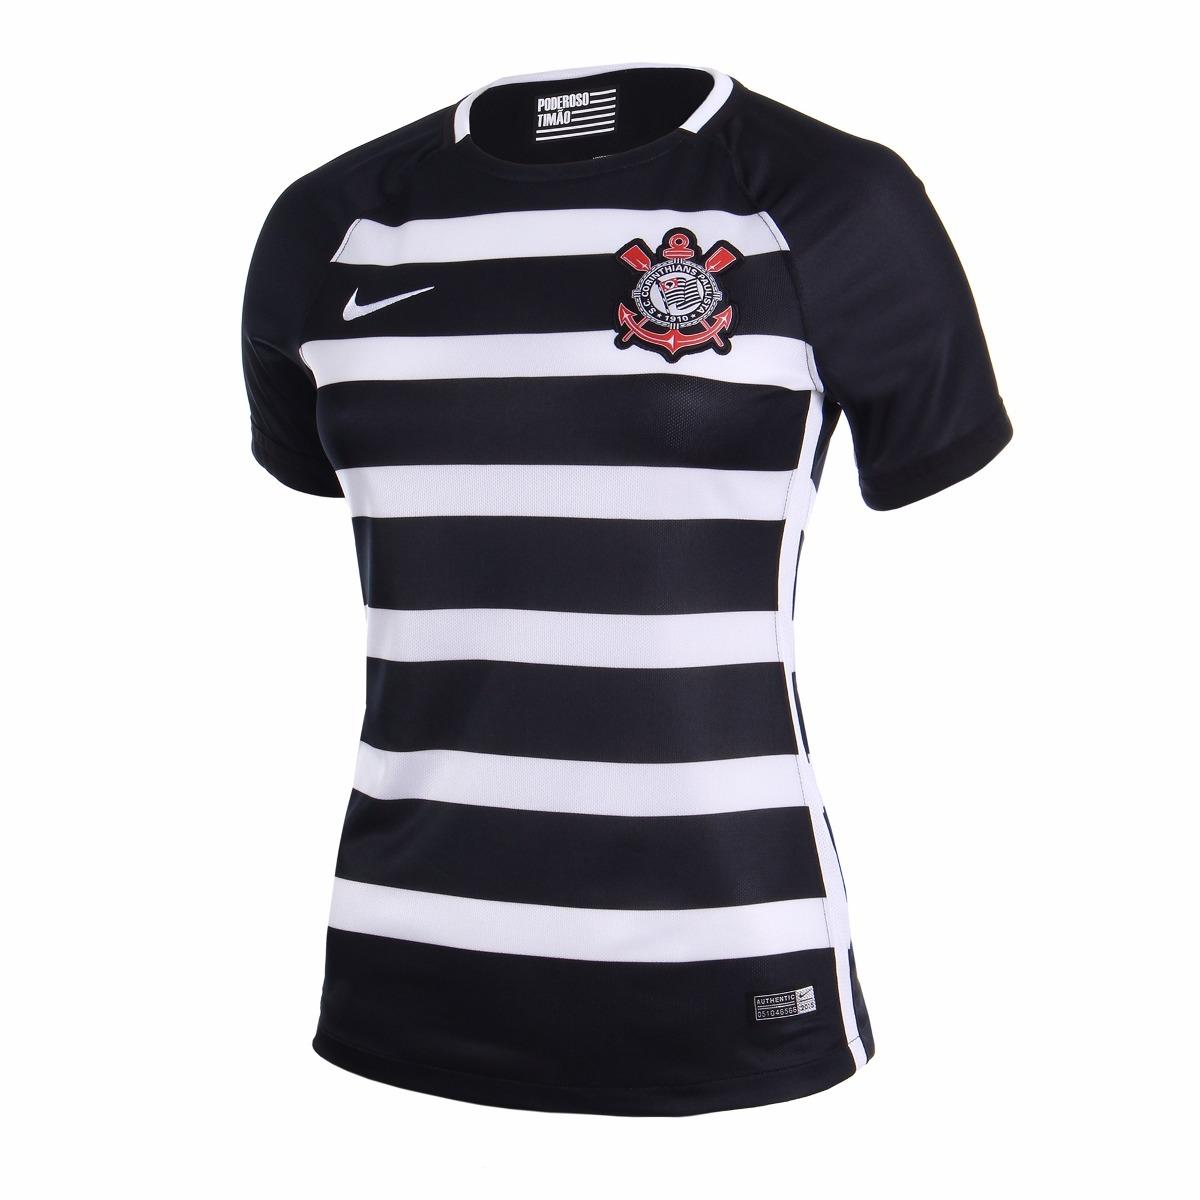 Camisa Corinthians Feminina 2016 Listrada Original - Netfut - R  159 ... 32706b19fc70a